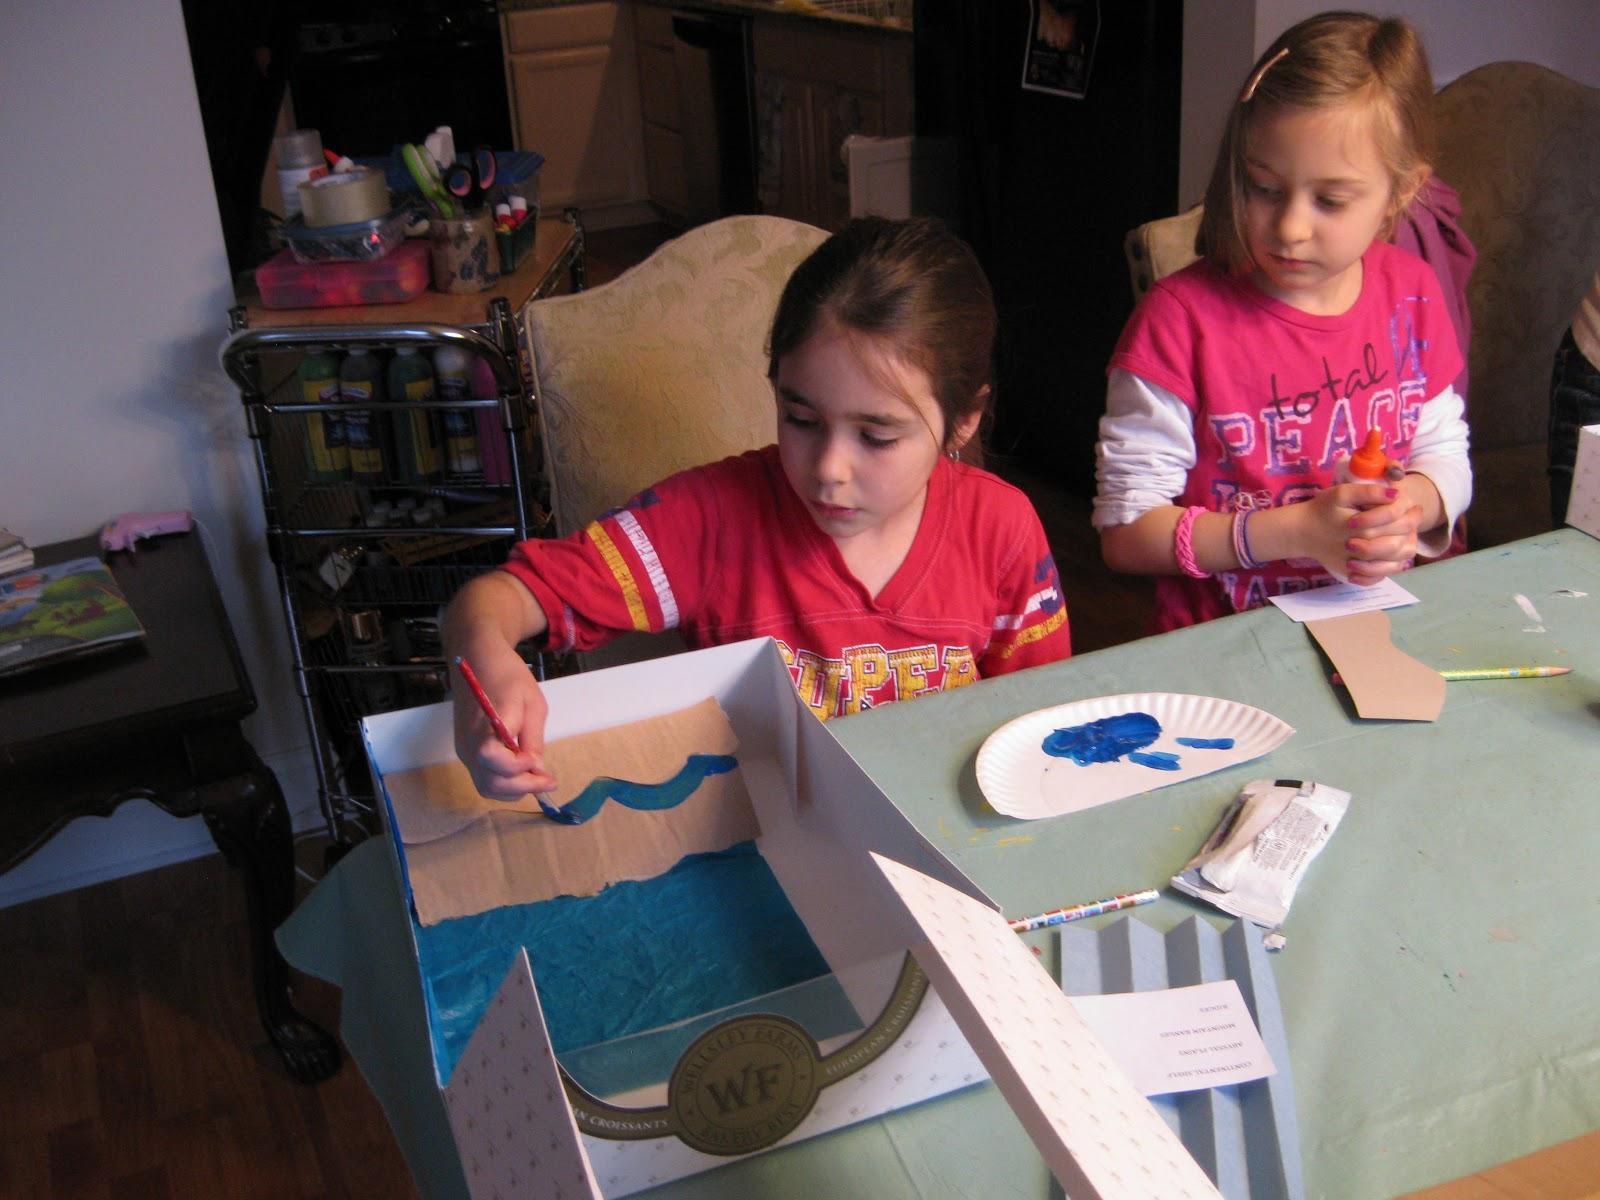 Kids Imitate Mom Eating Healthy Food Cartoon Pic